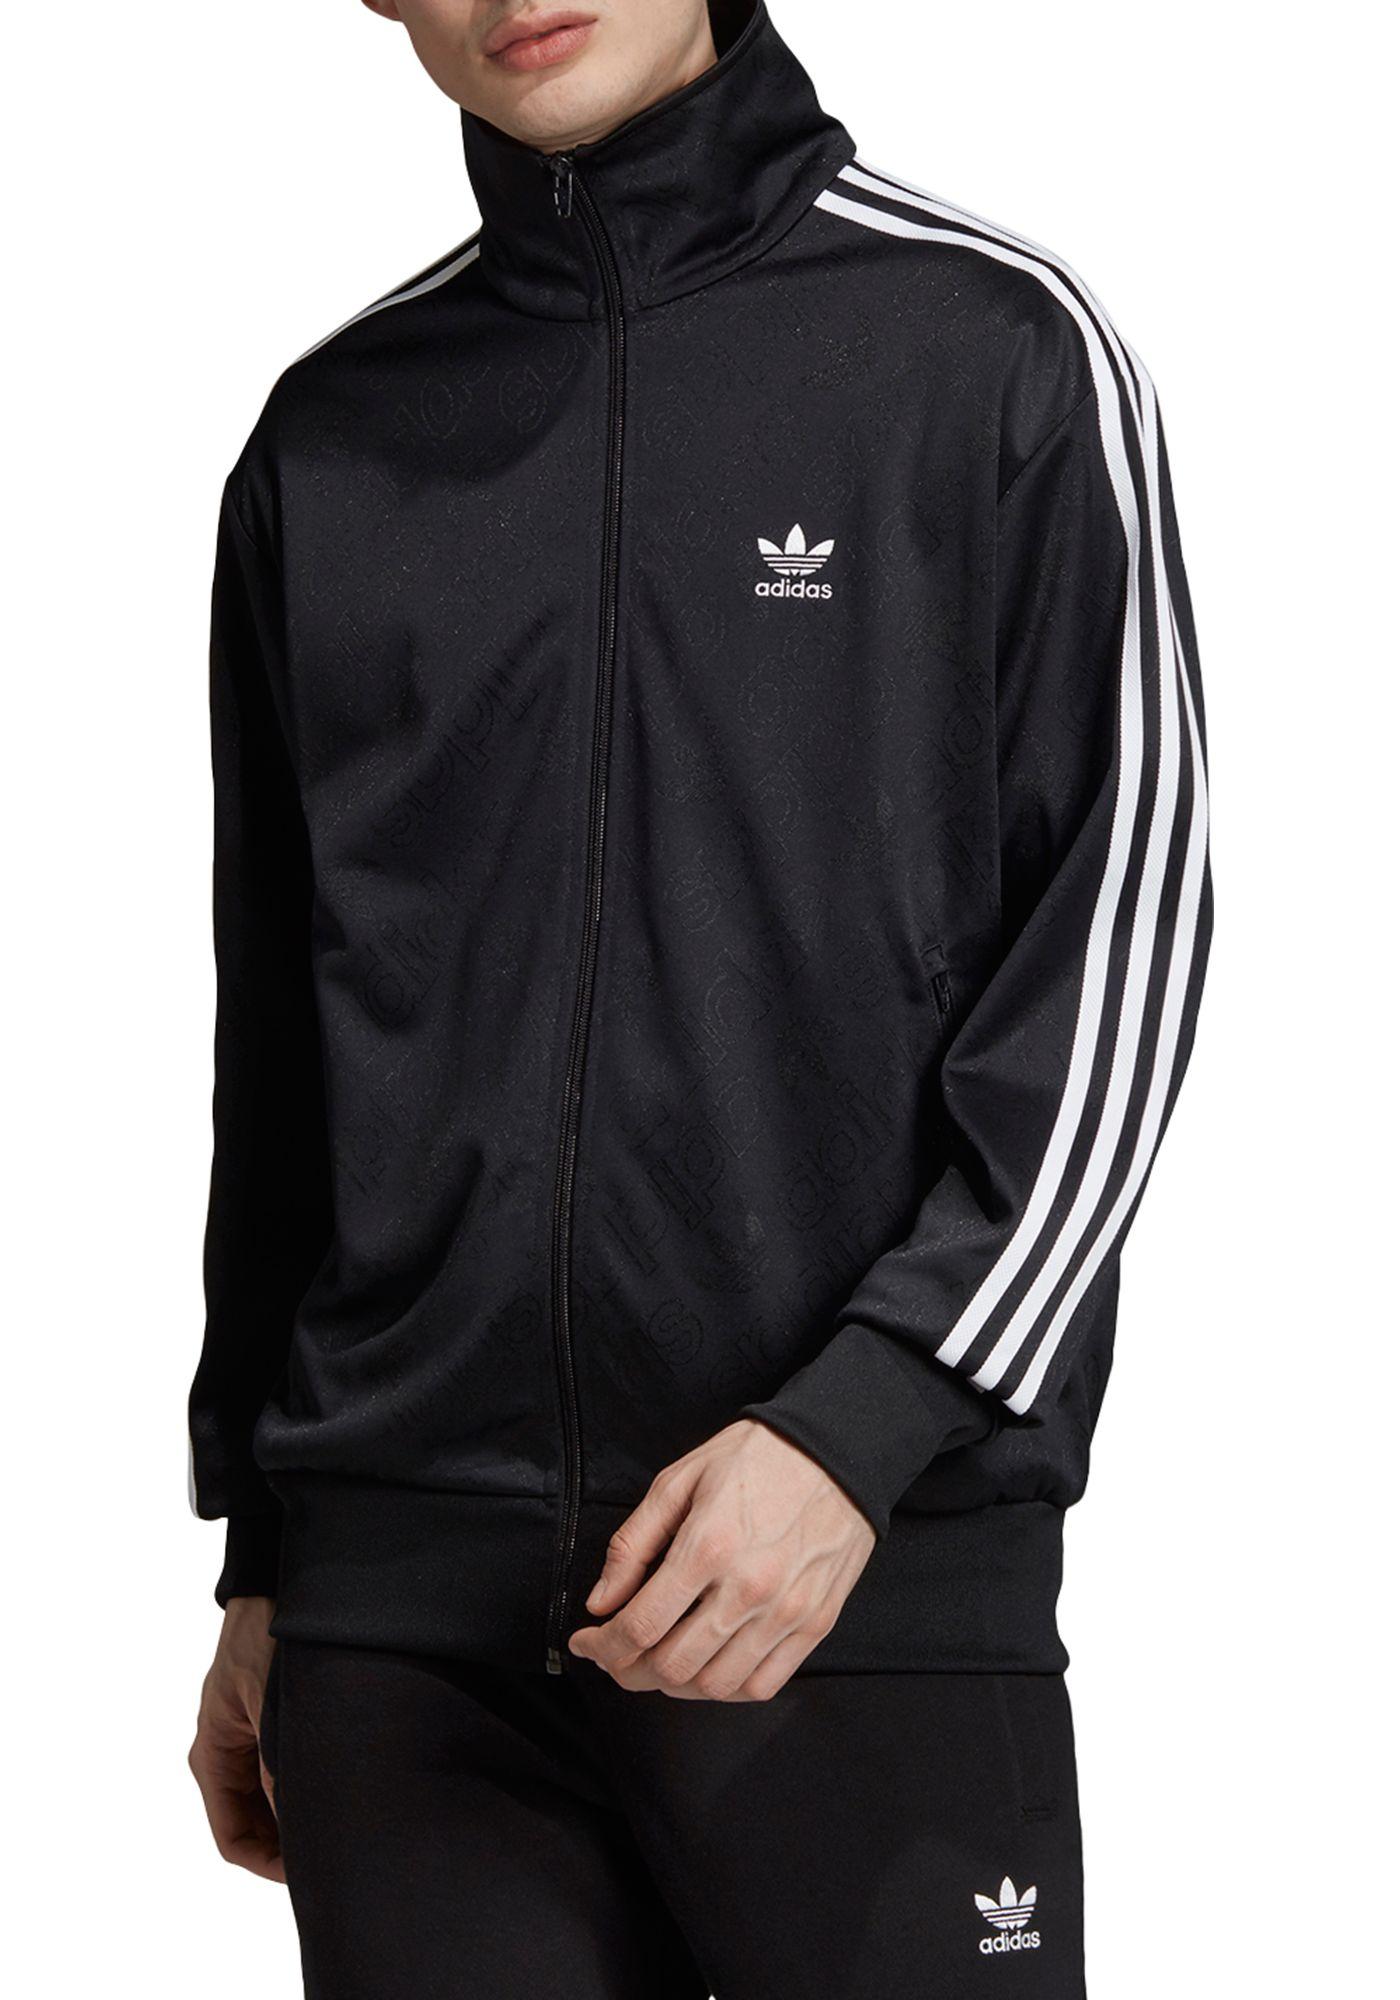 adidas Originals Men's Monogram Track Jacket